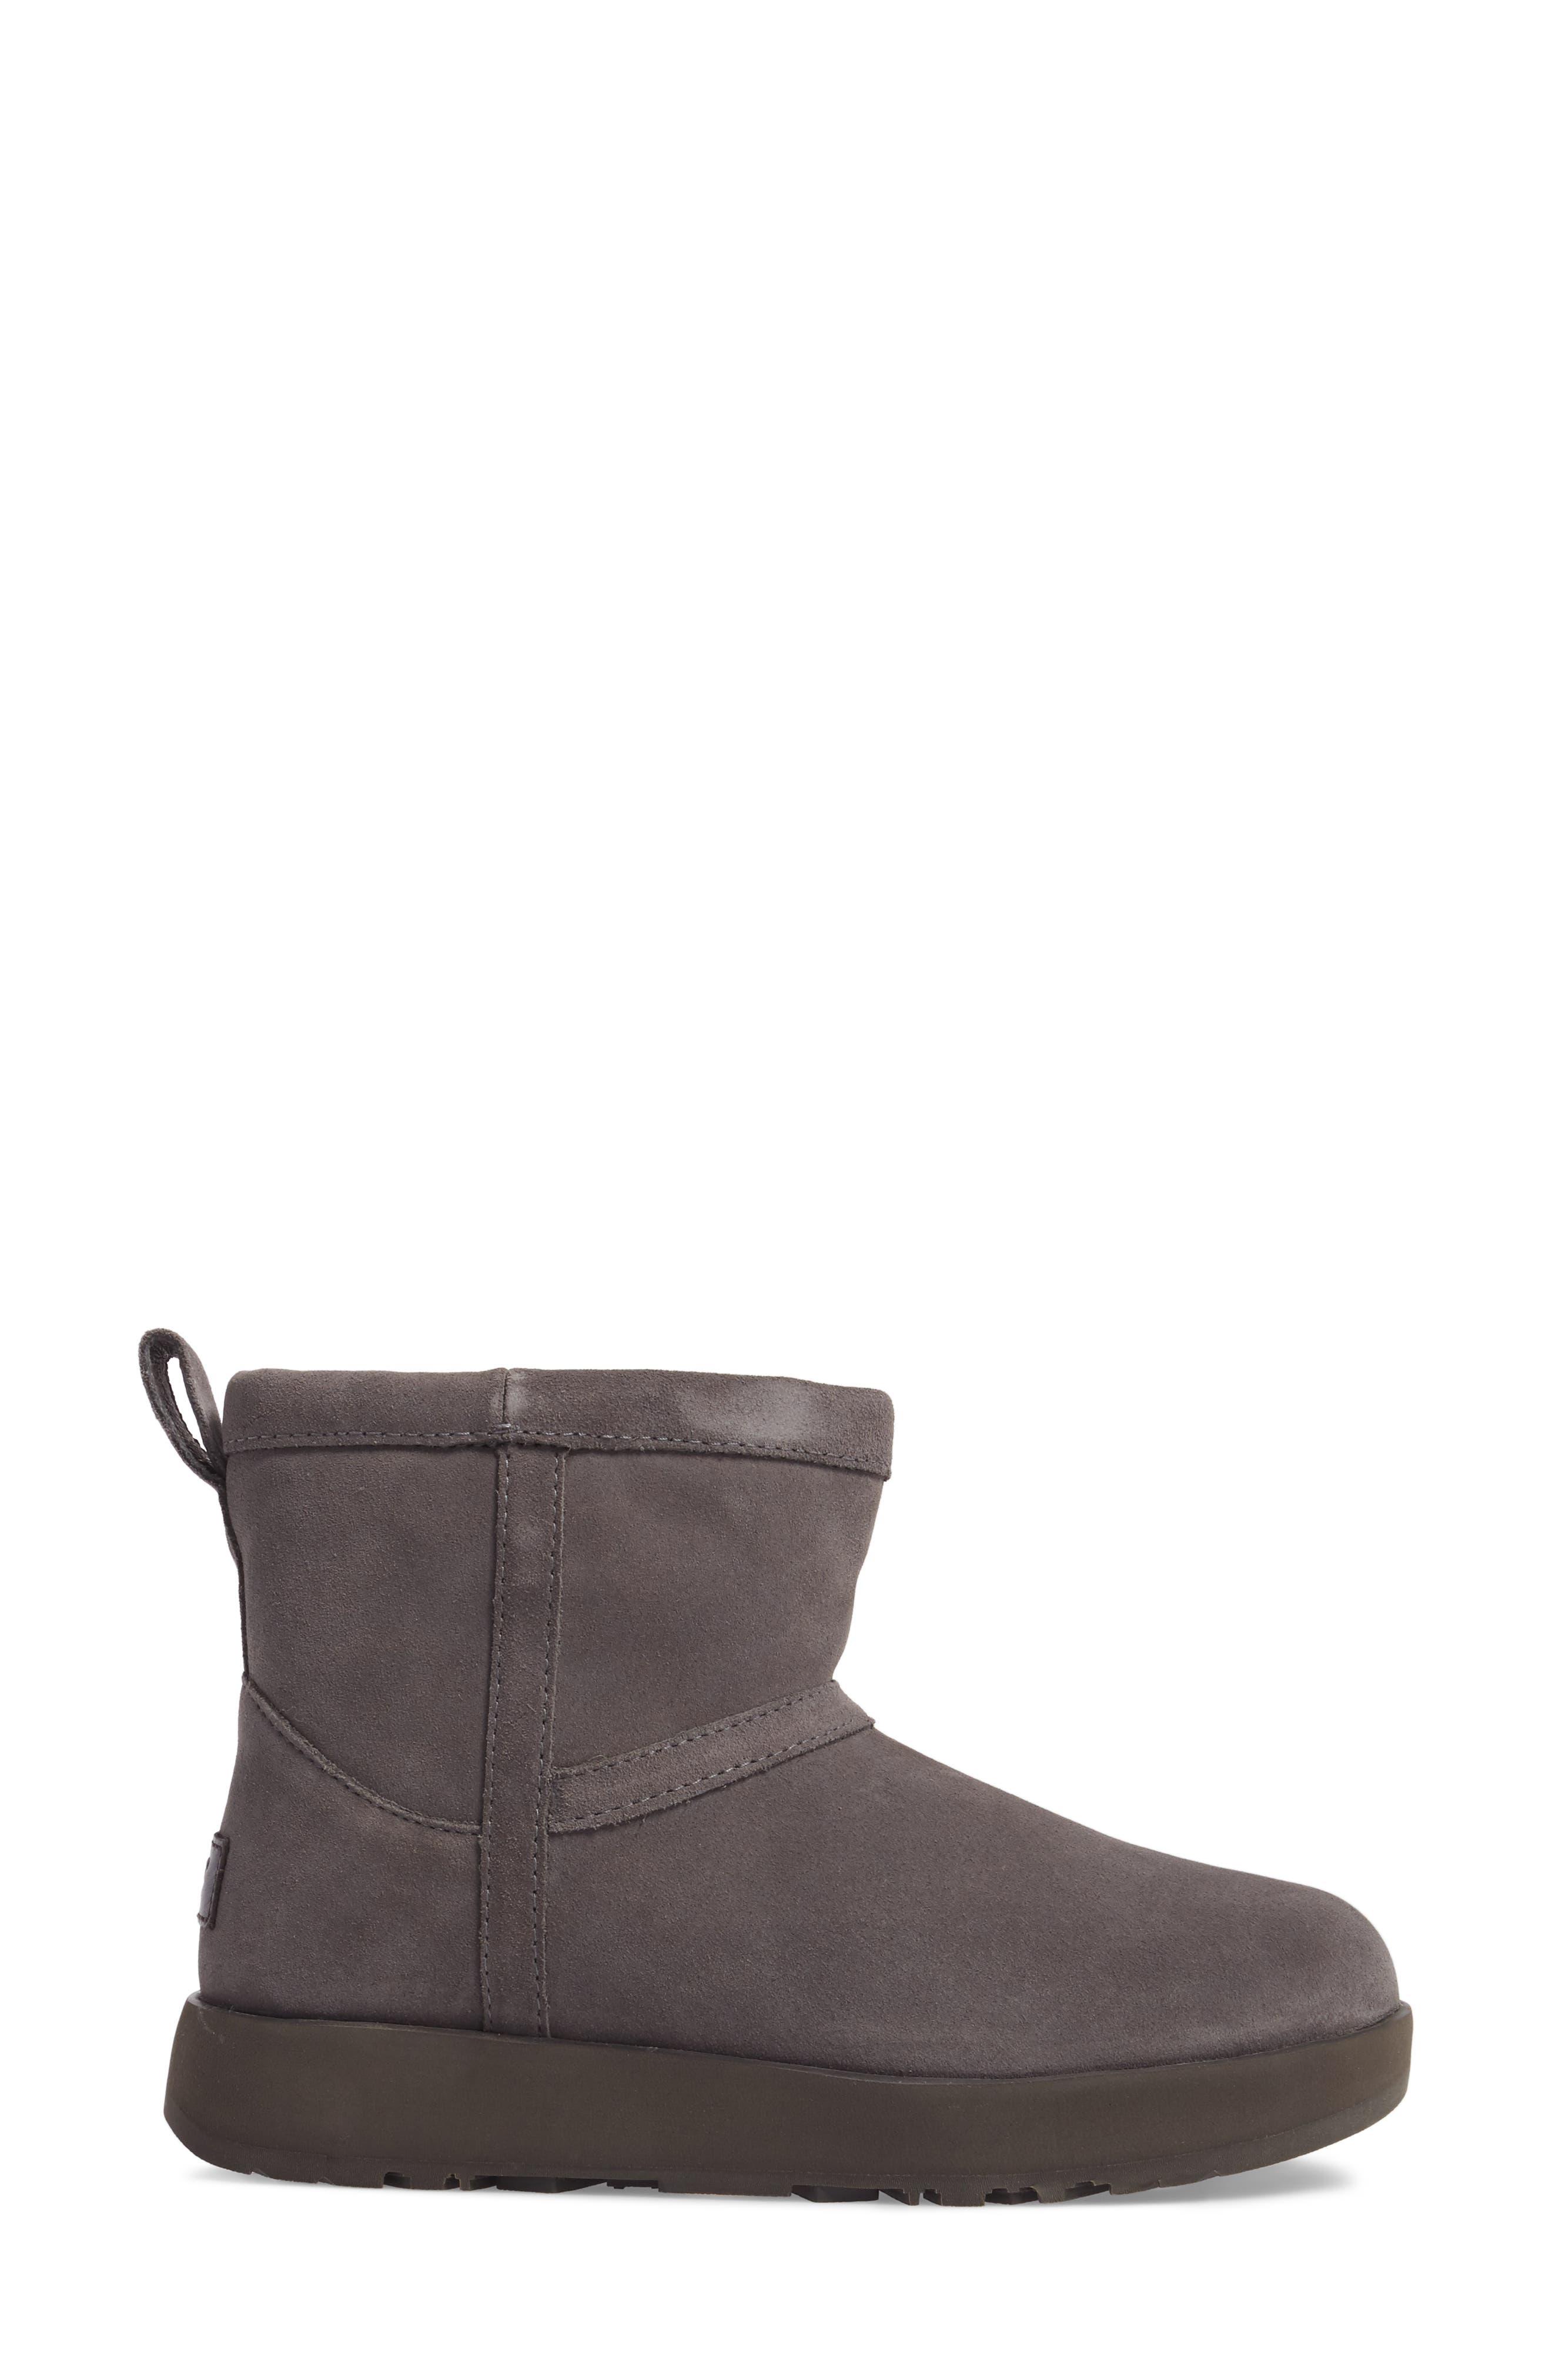 Alternate Image 3  - UGG® Classic Mini Waterproof Boot (Women)